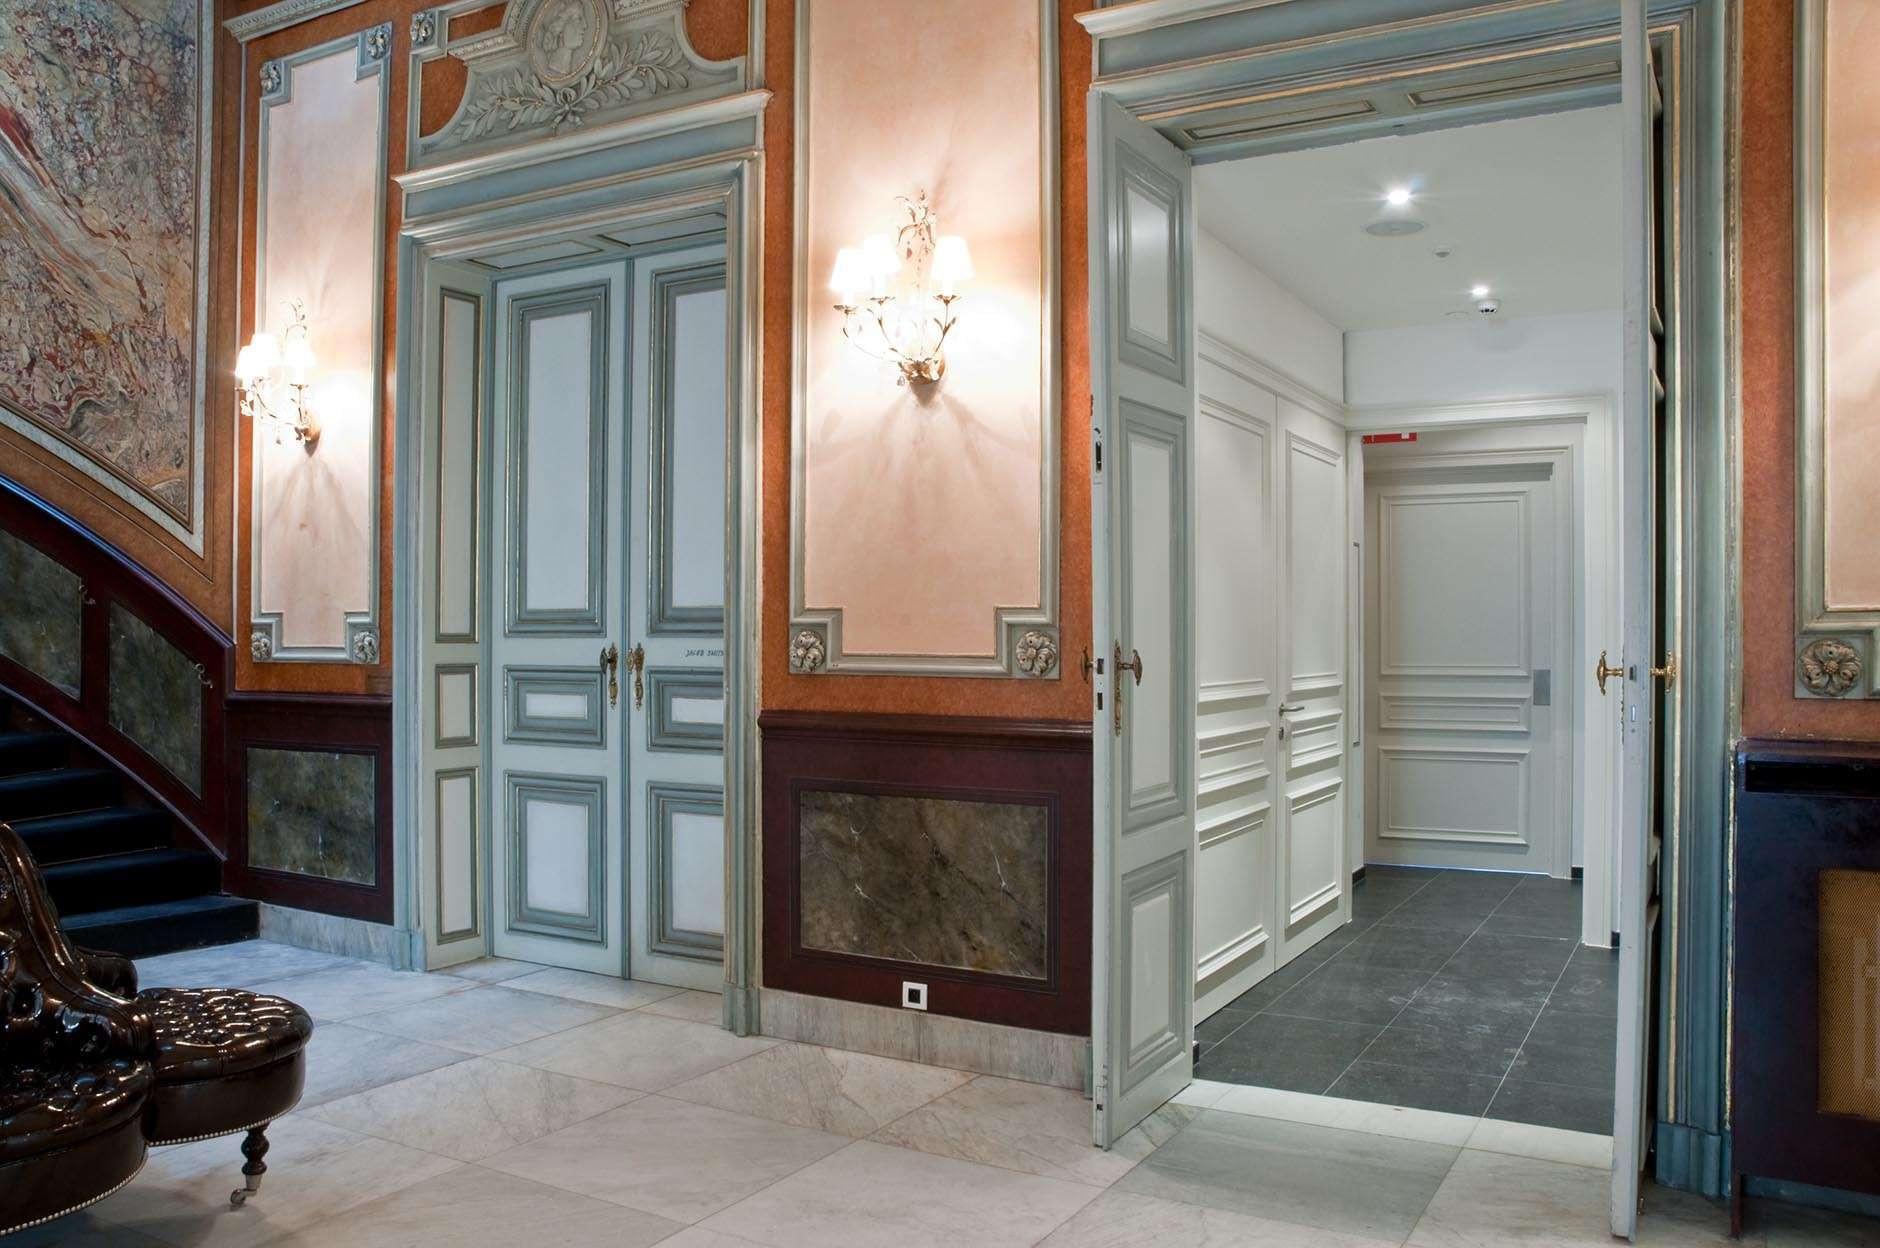 Nordex_Hotel Reylof_2